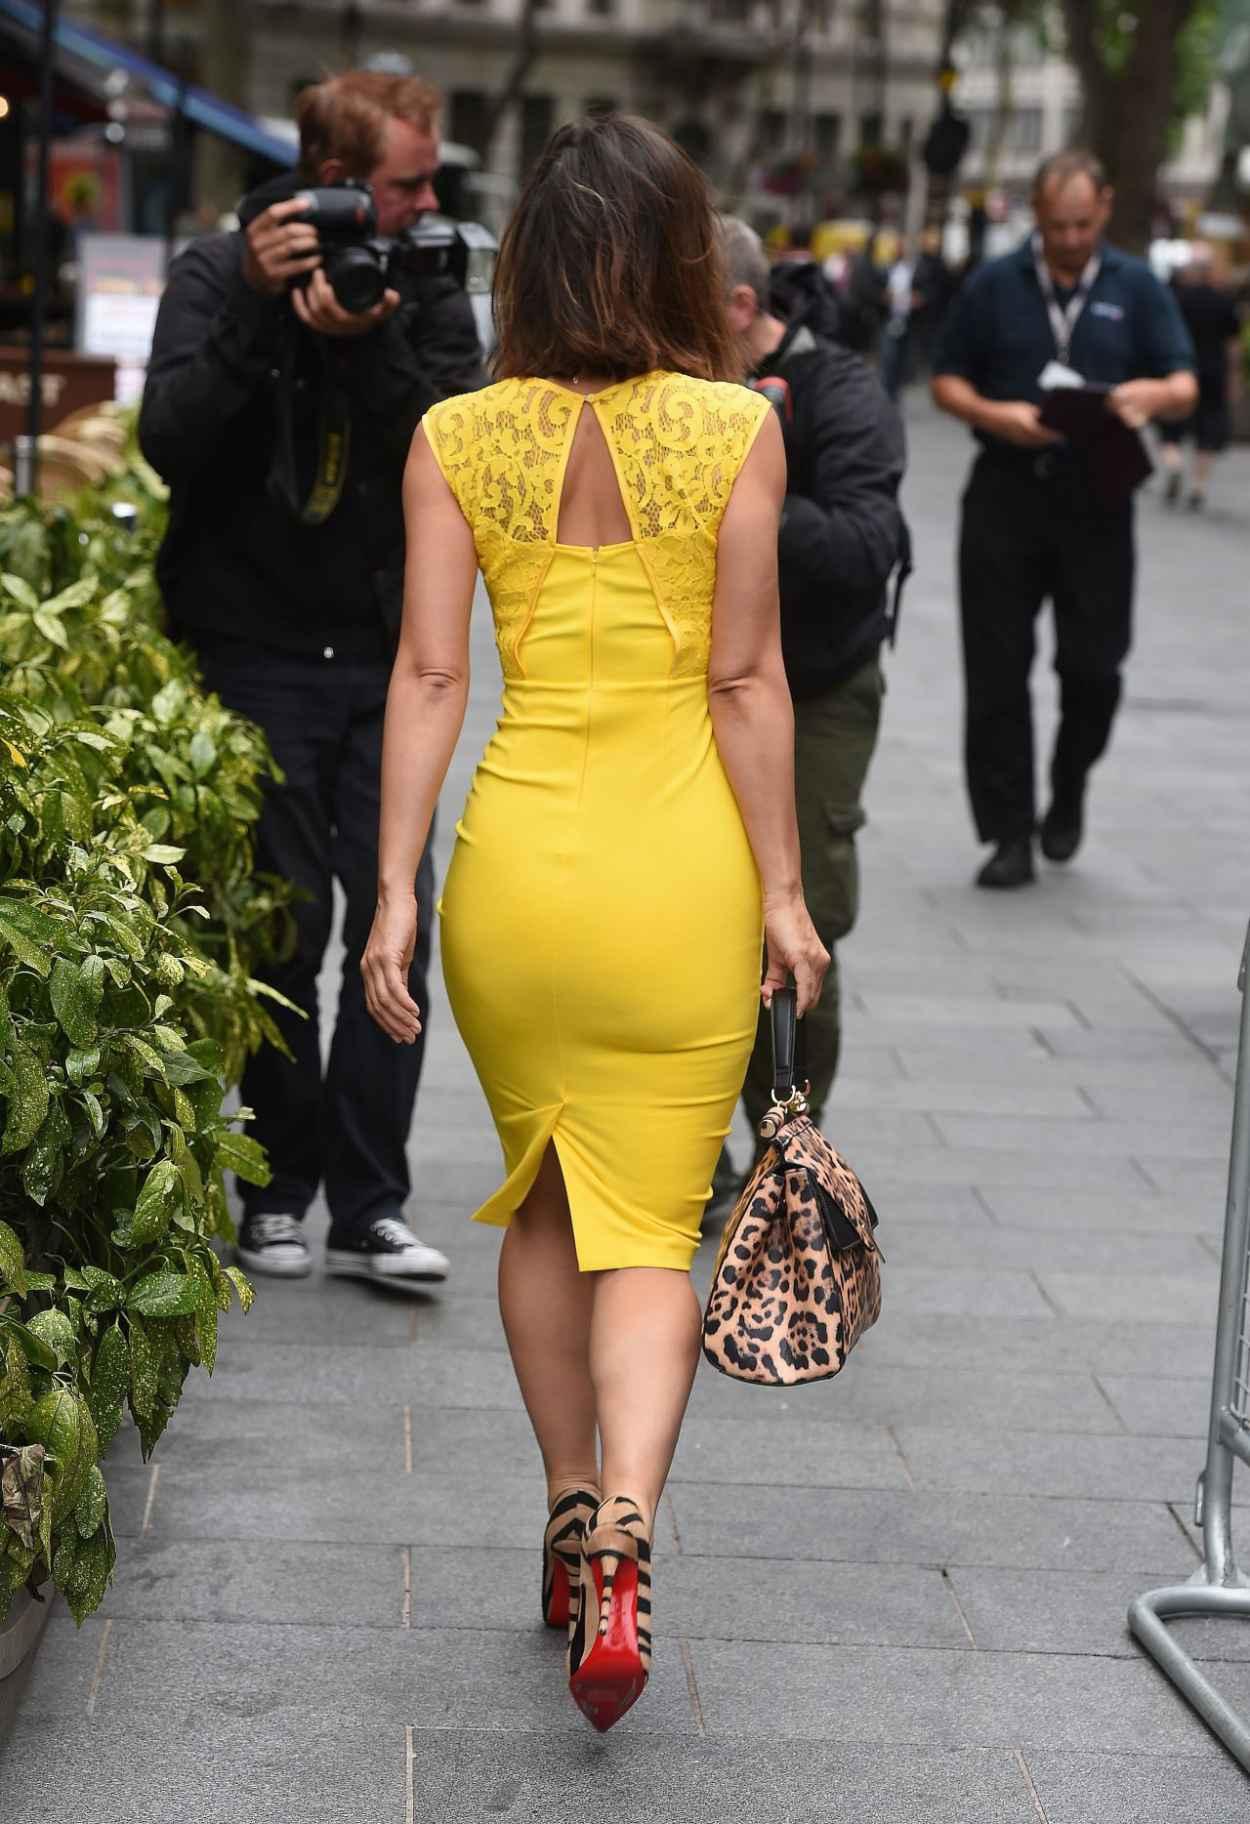 Myleene Klass Style - Arrives at Global Radio in London, July 2015-5